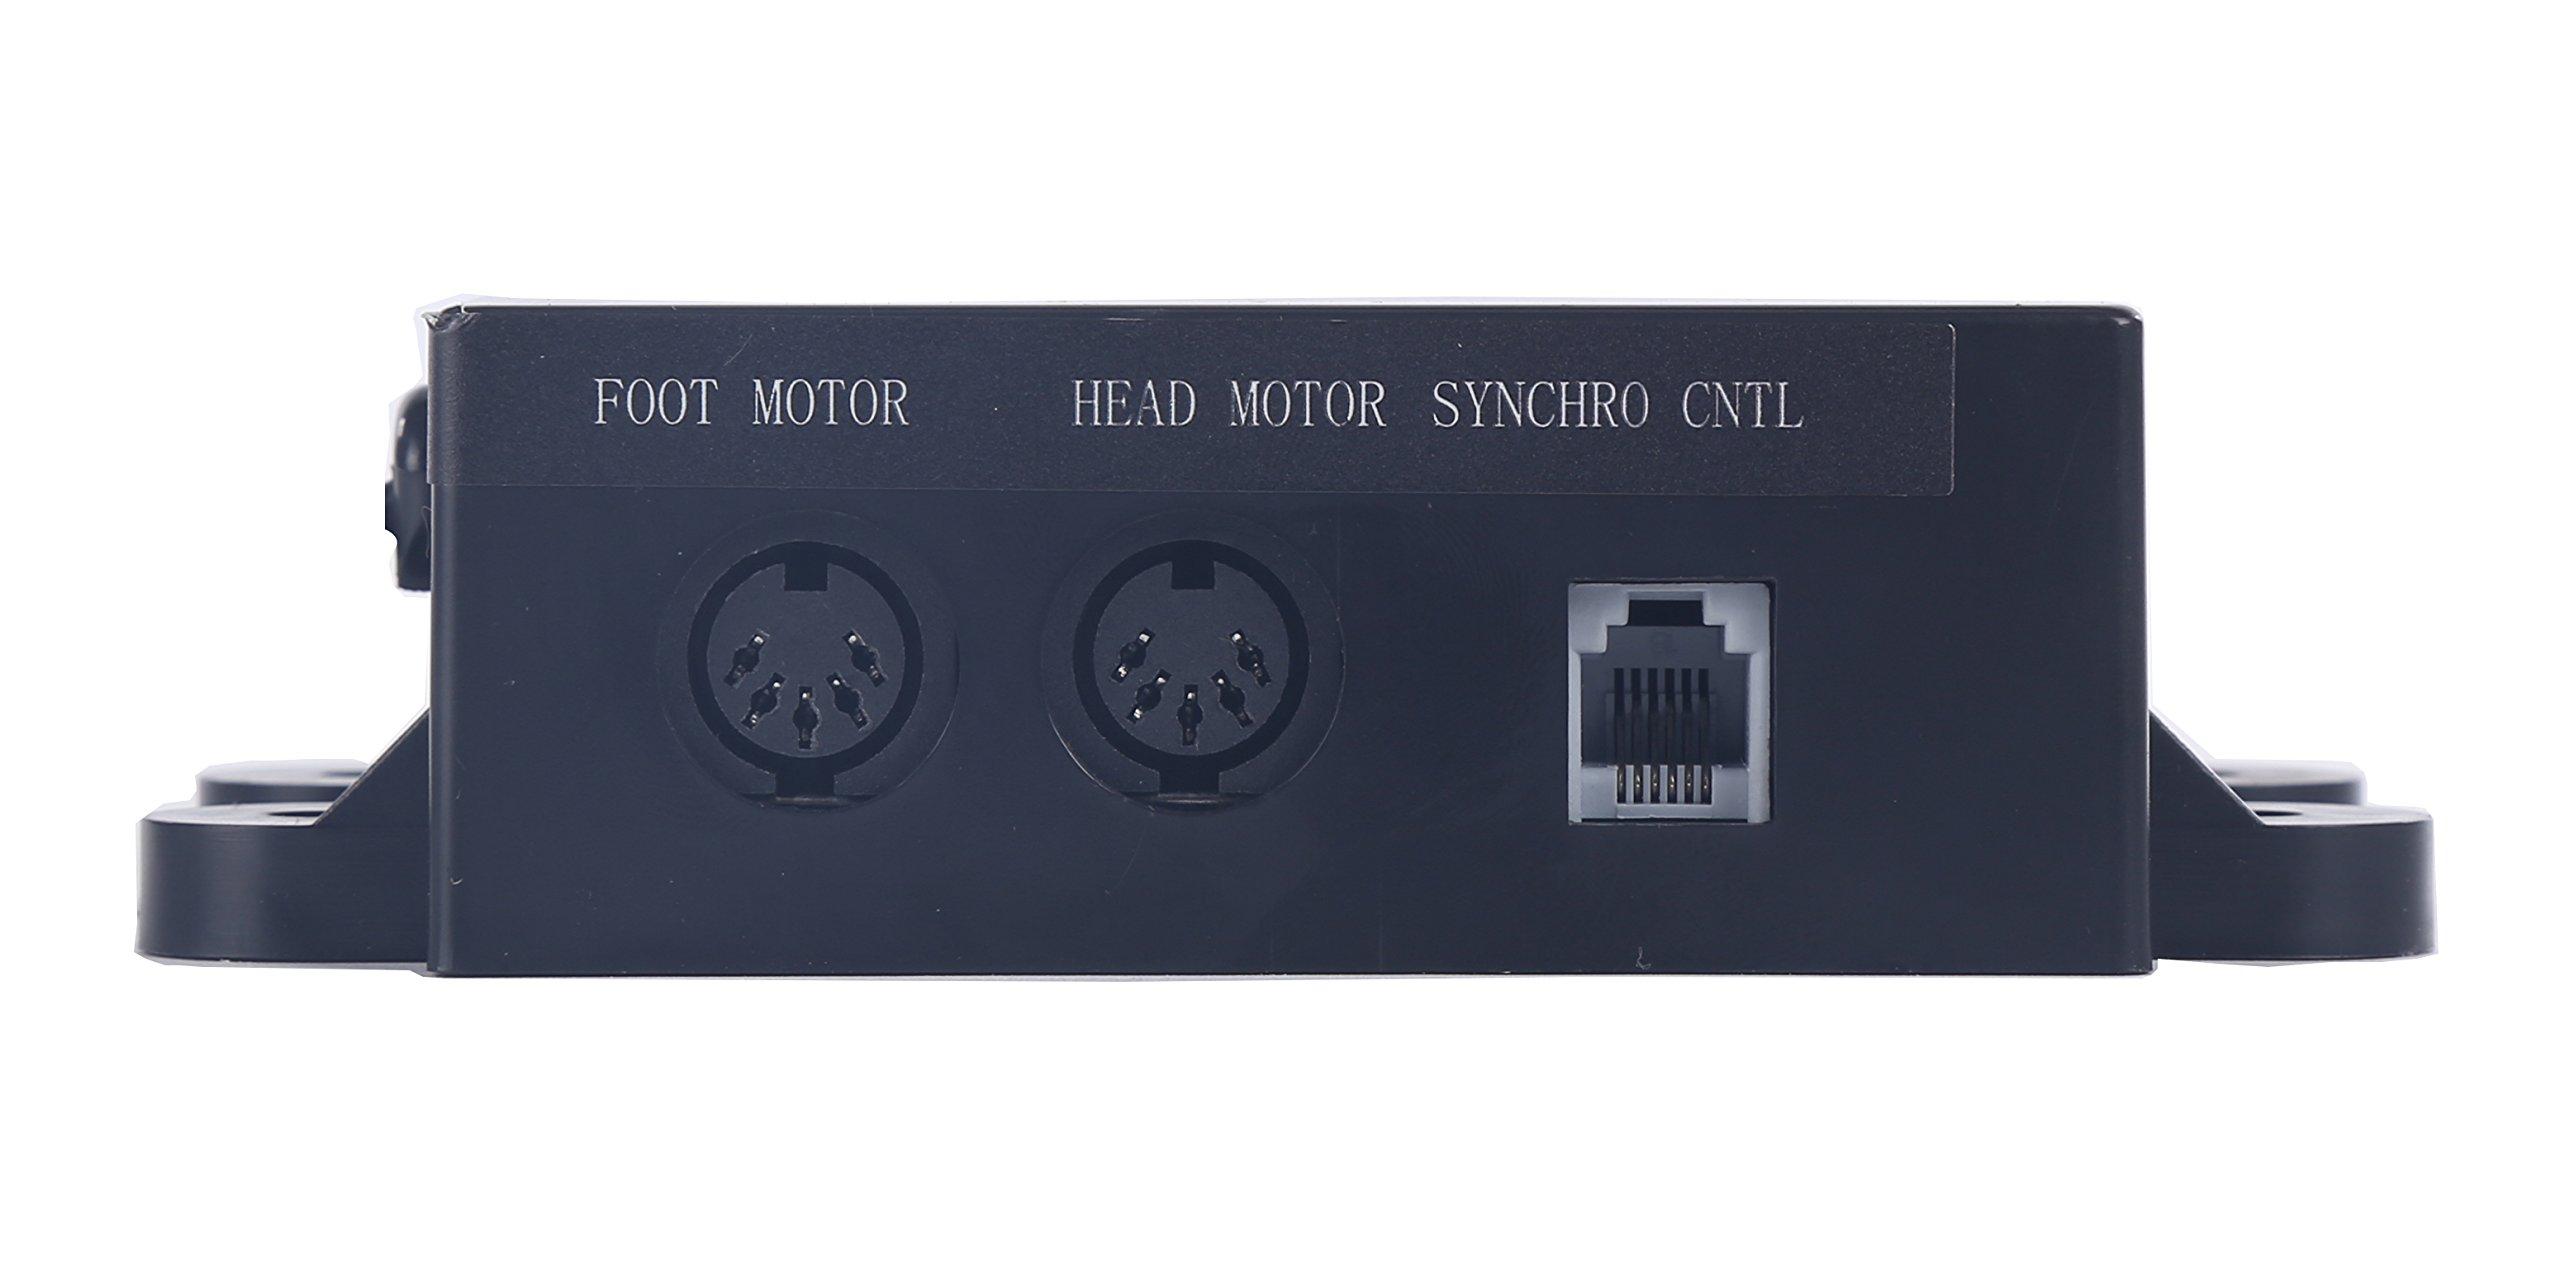 HOFISH Adjustable Bed Motor Control Box